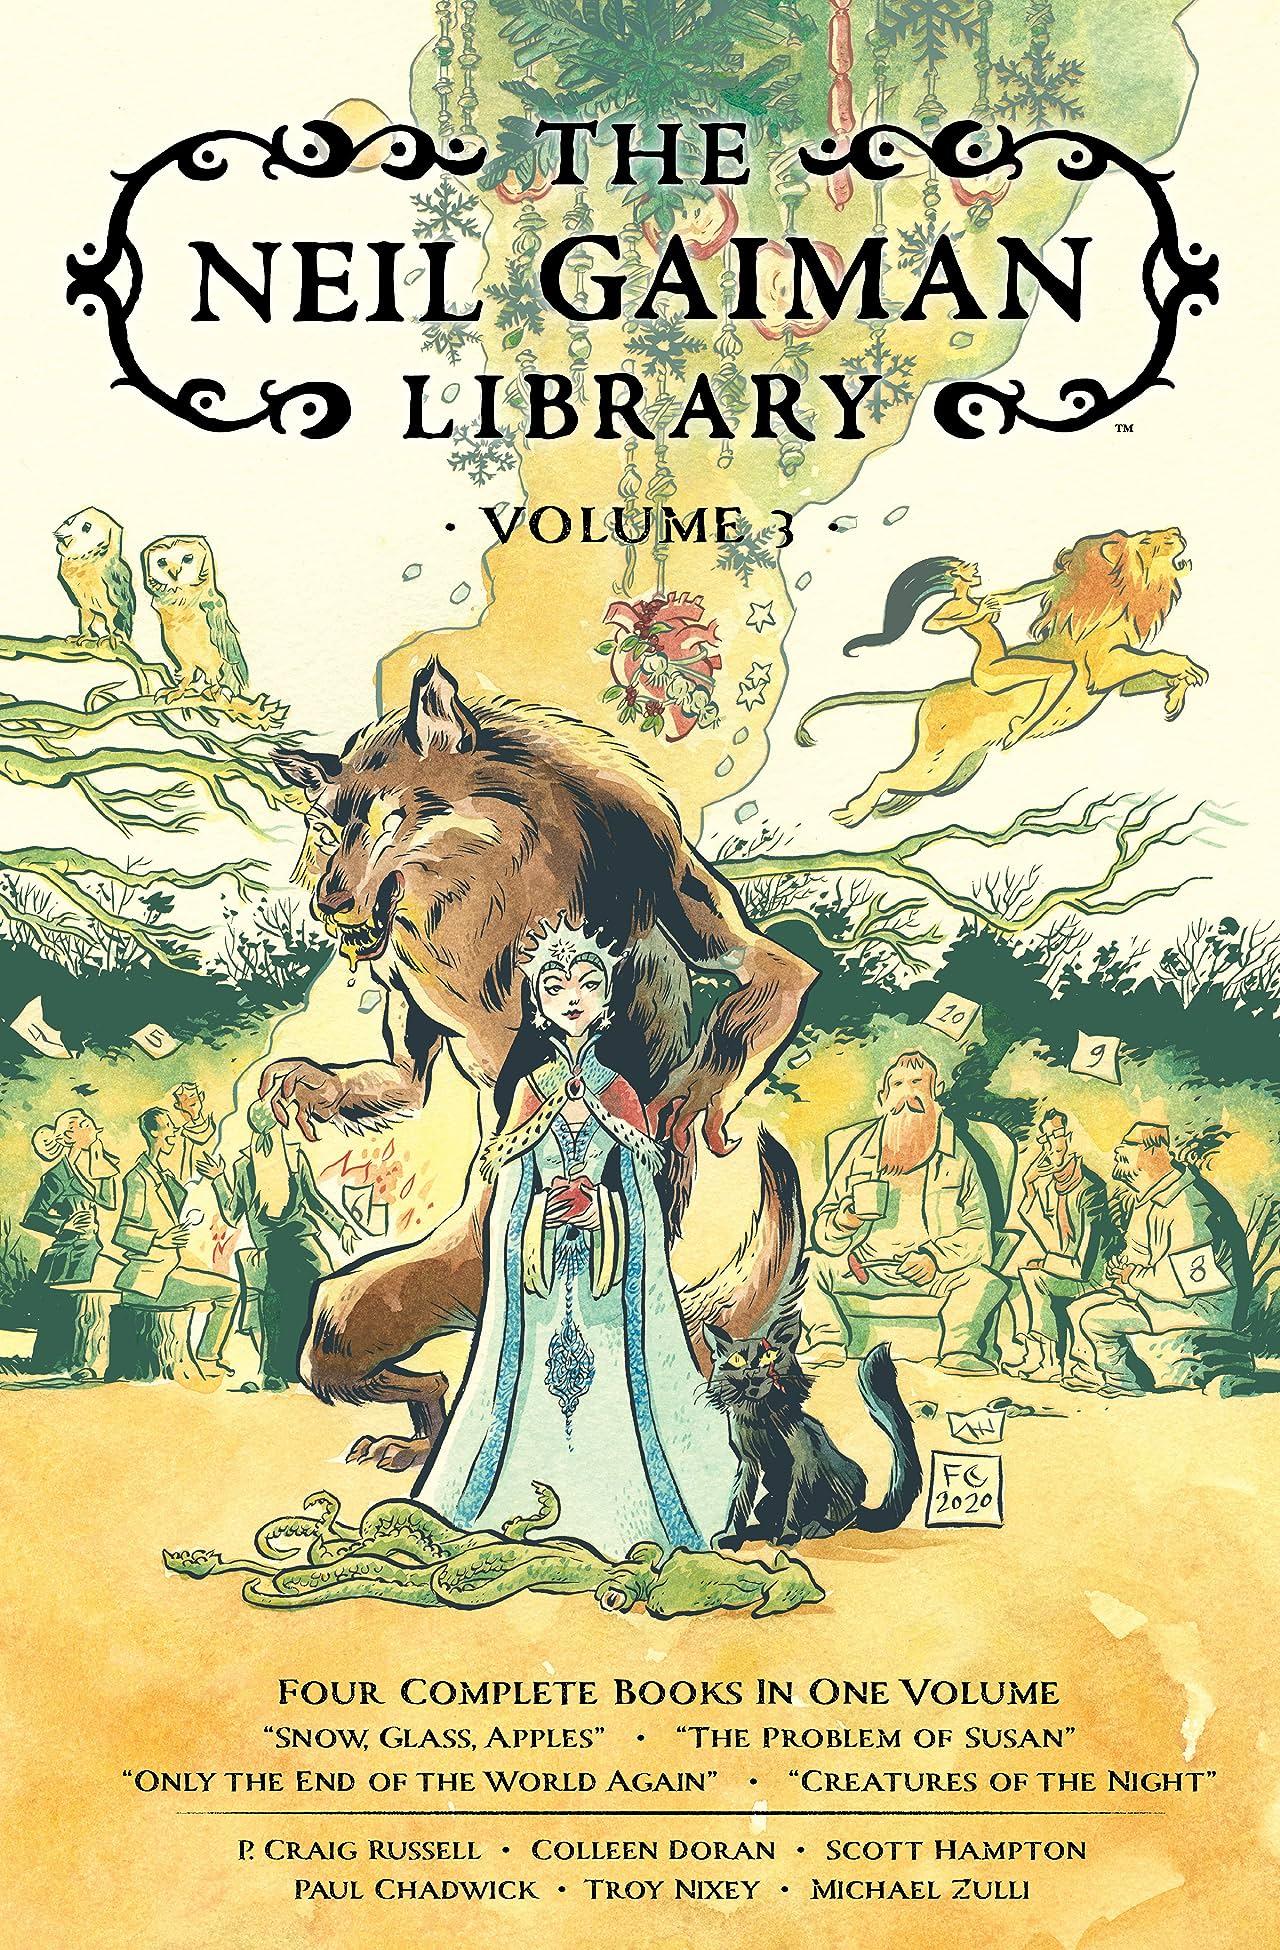 The Neil Gaiman Library Vol. 3